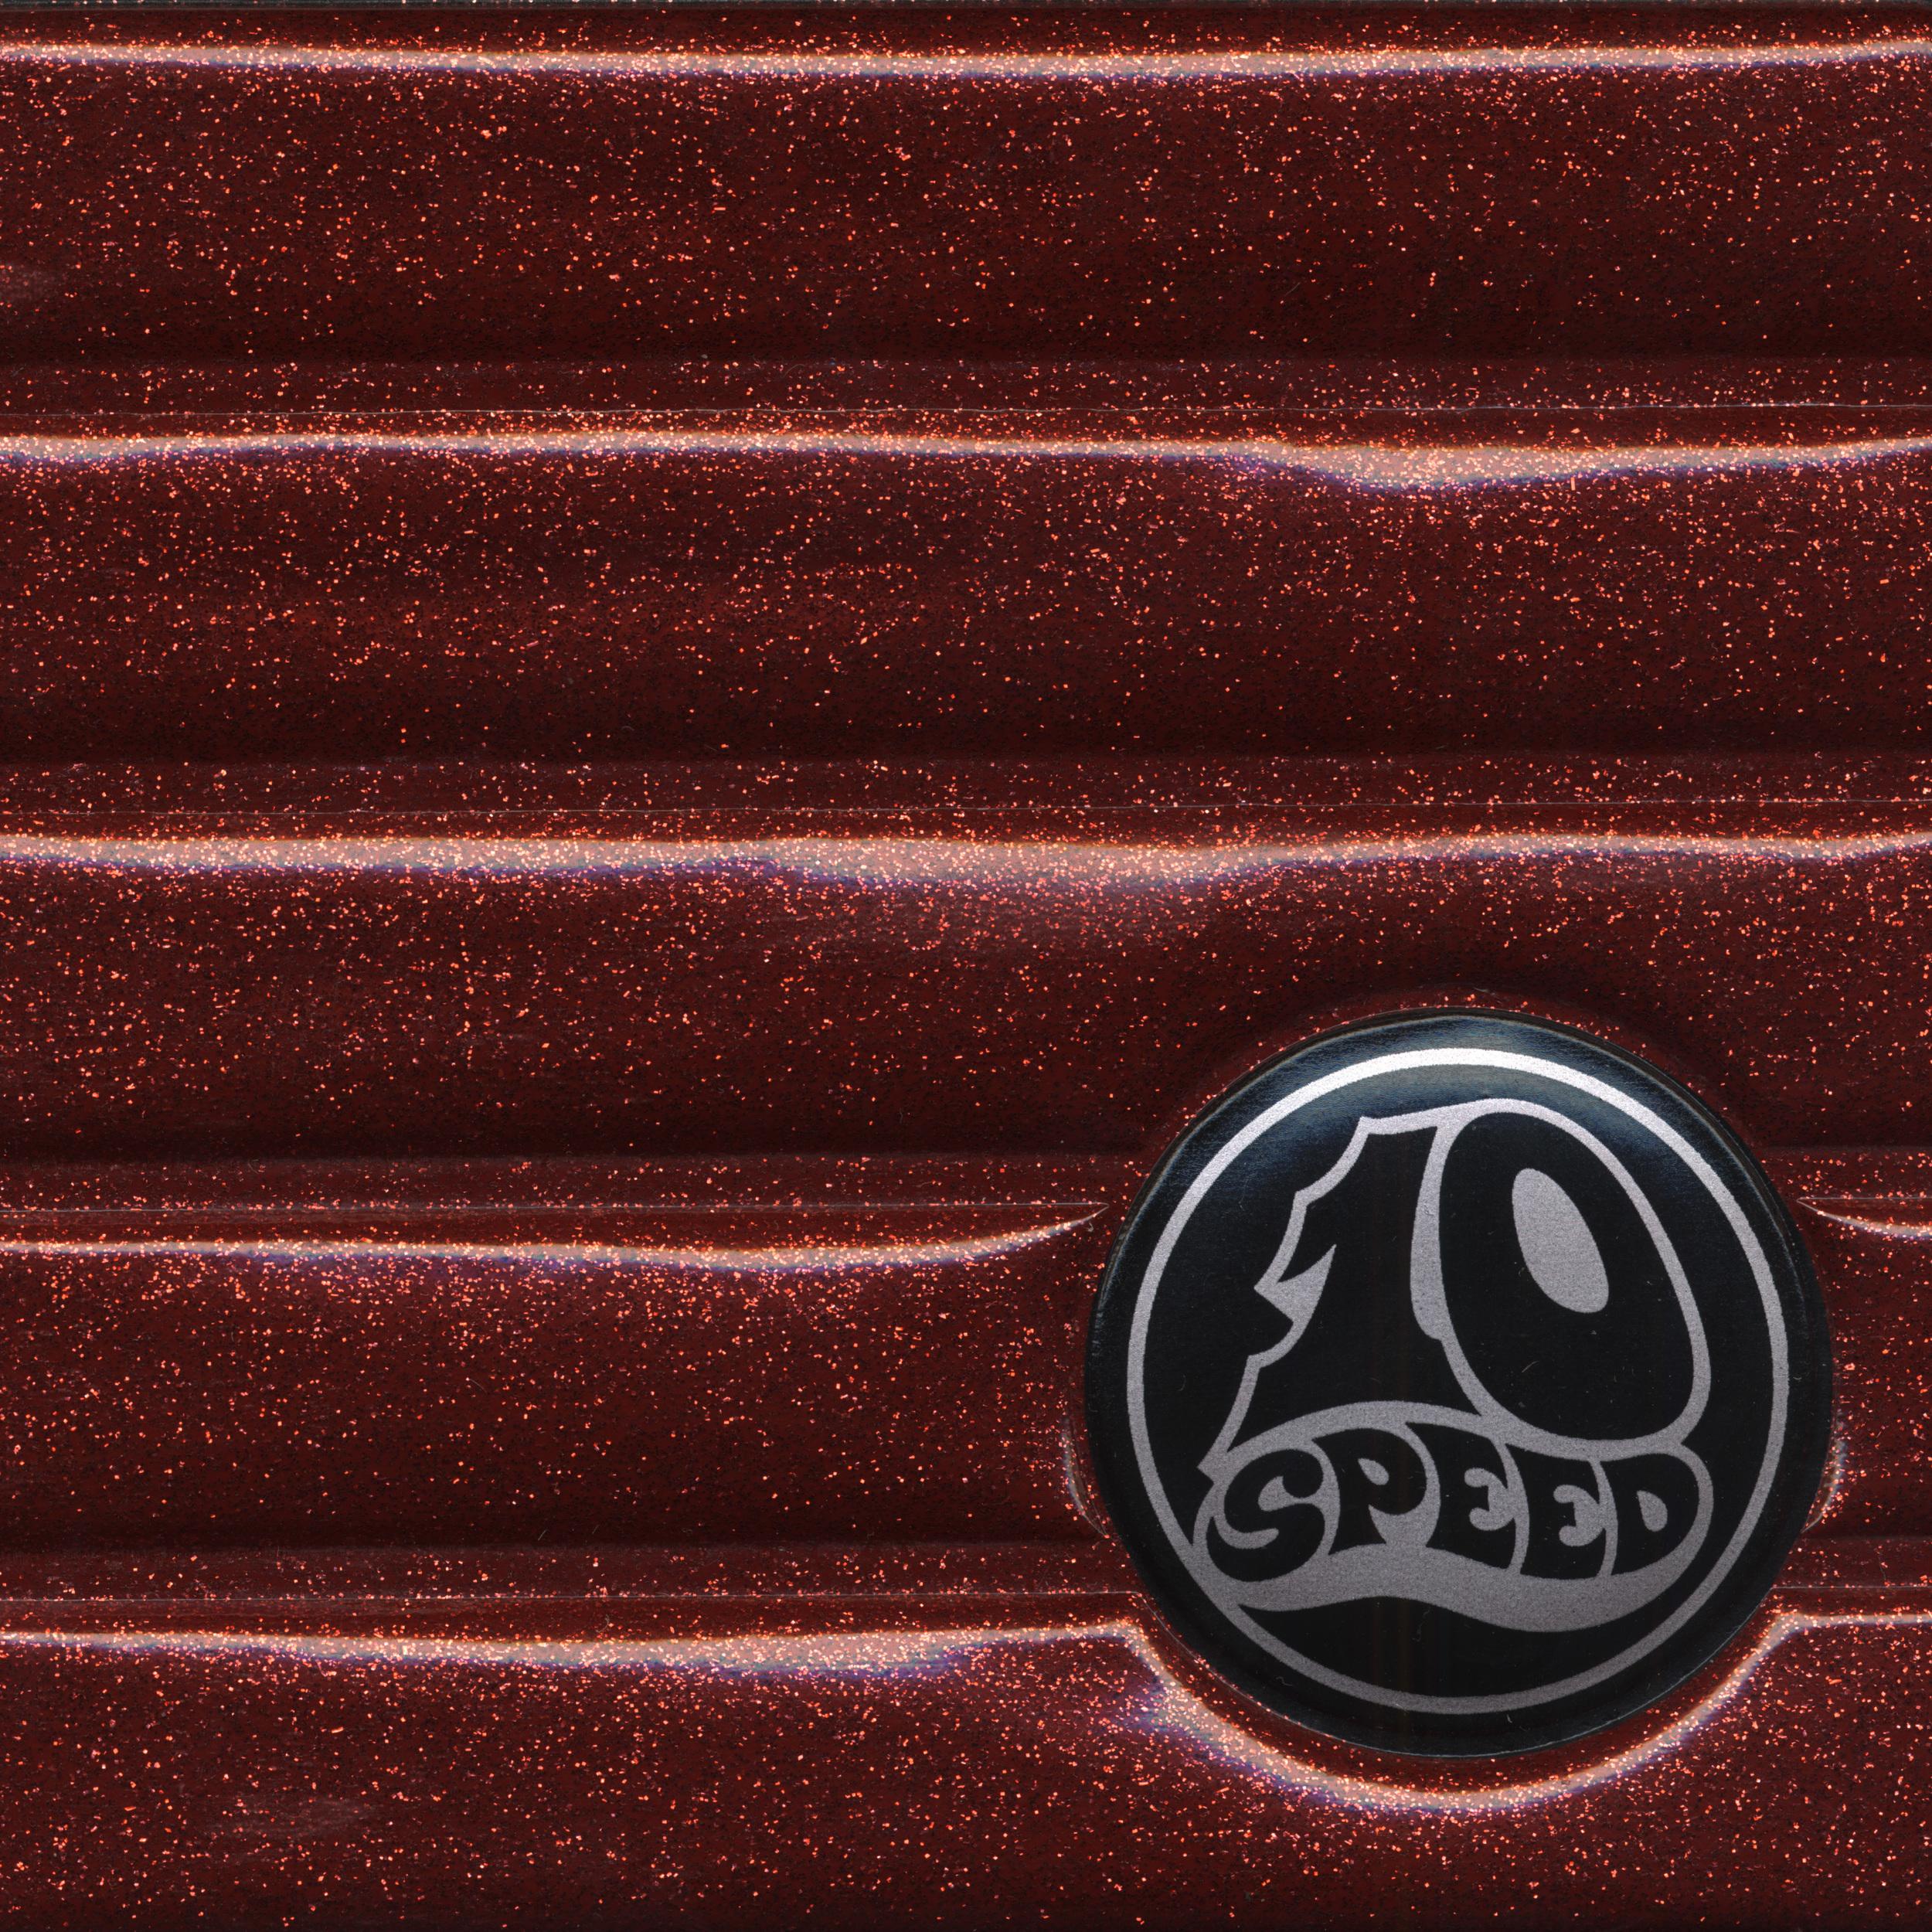 10 Speed_cover.jpg